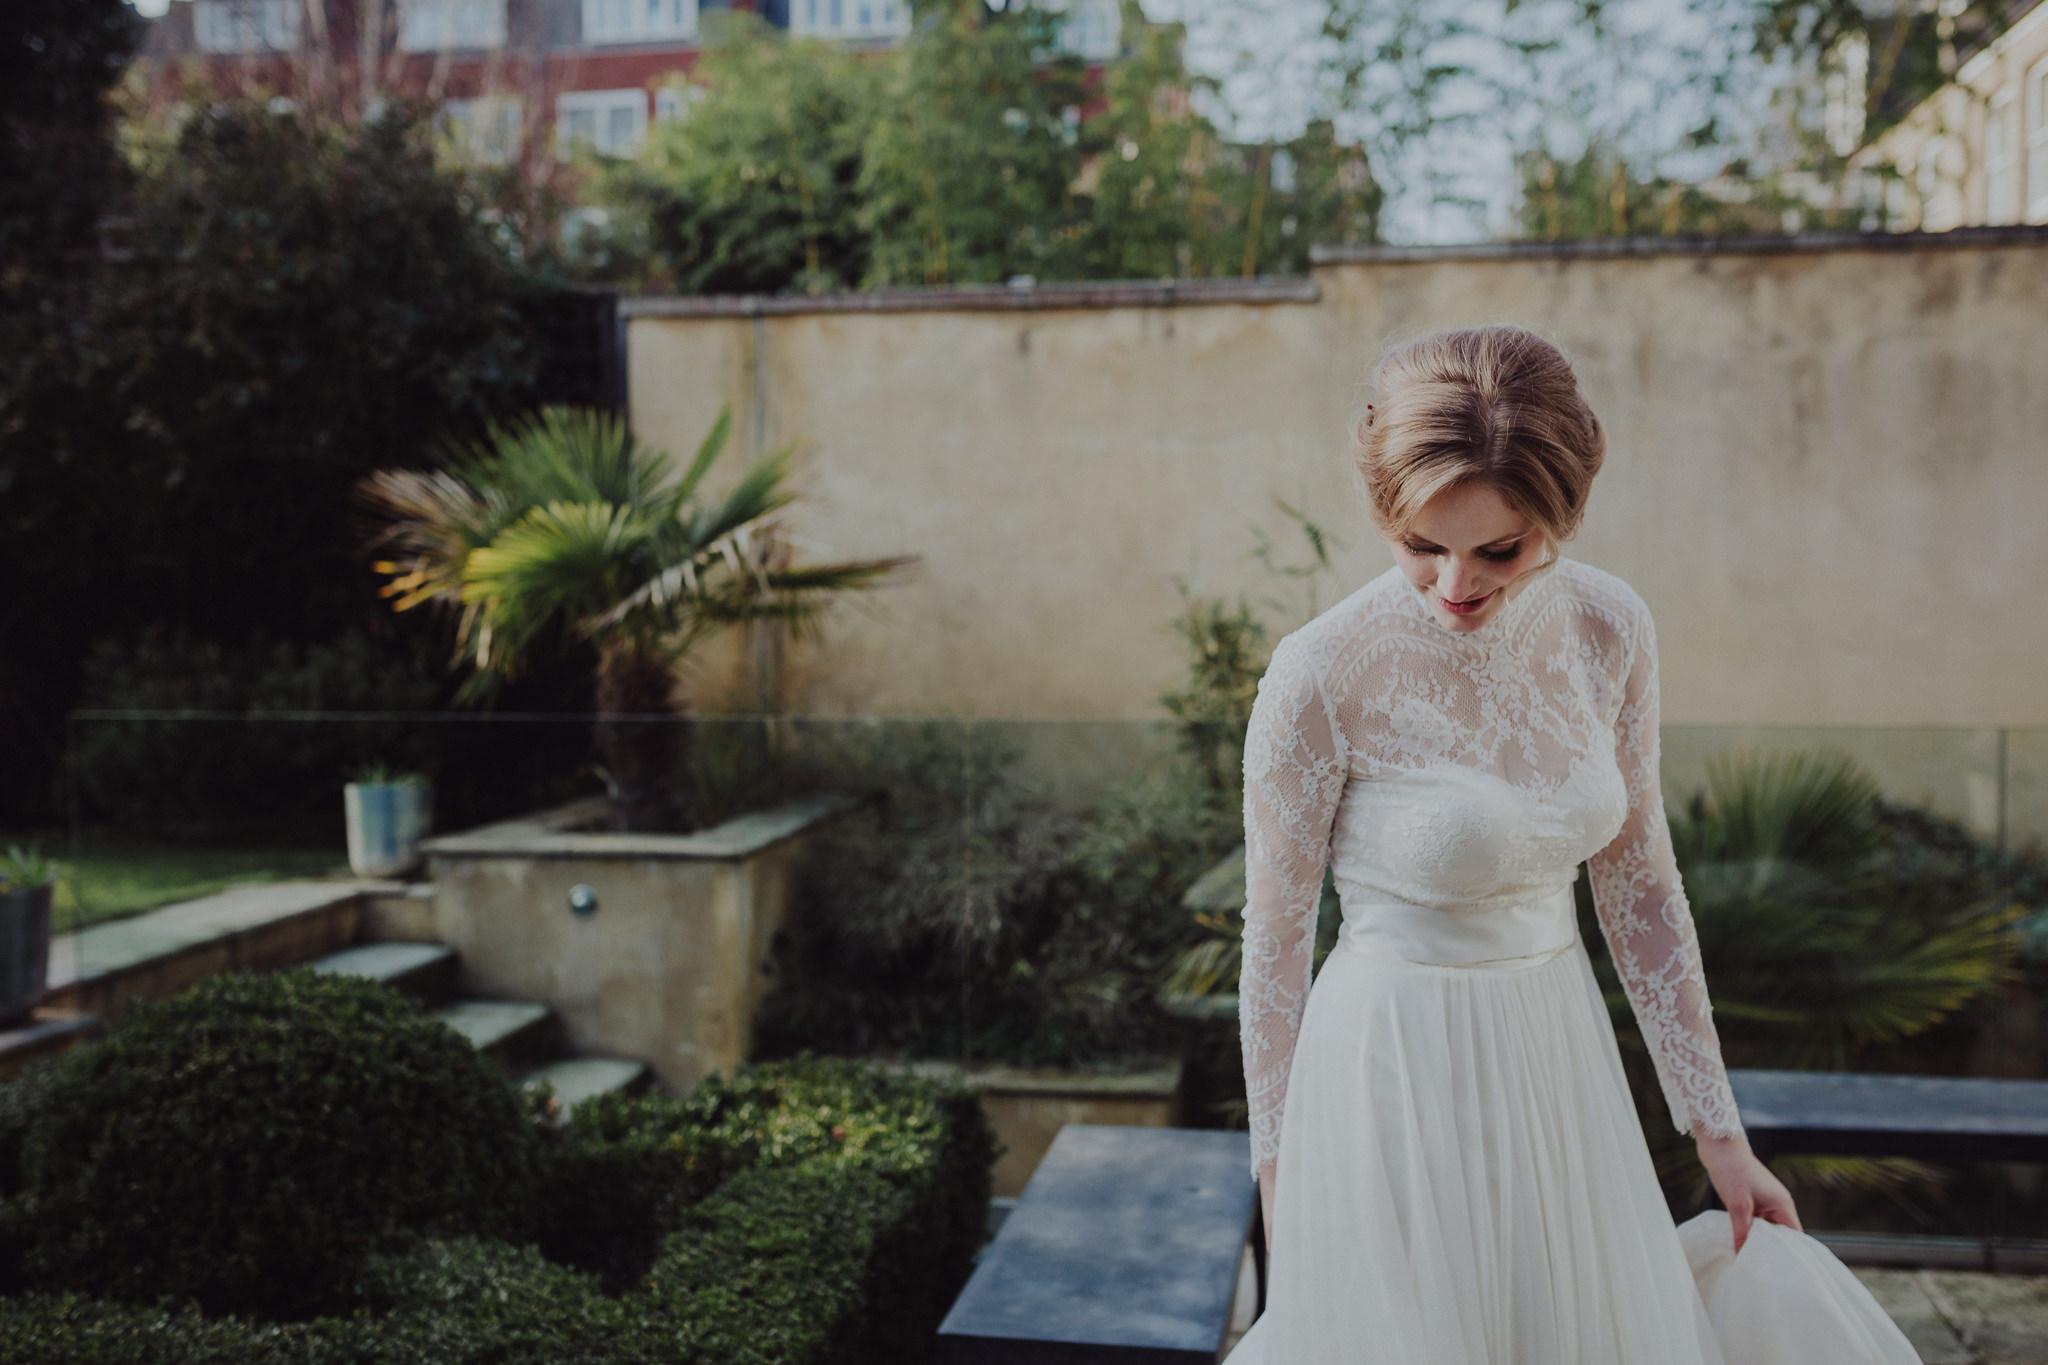 hampstead_wedding_photography_kate_gray-18.jpg